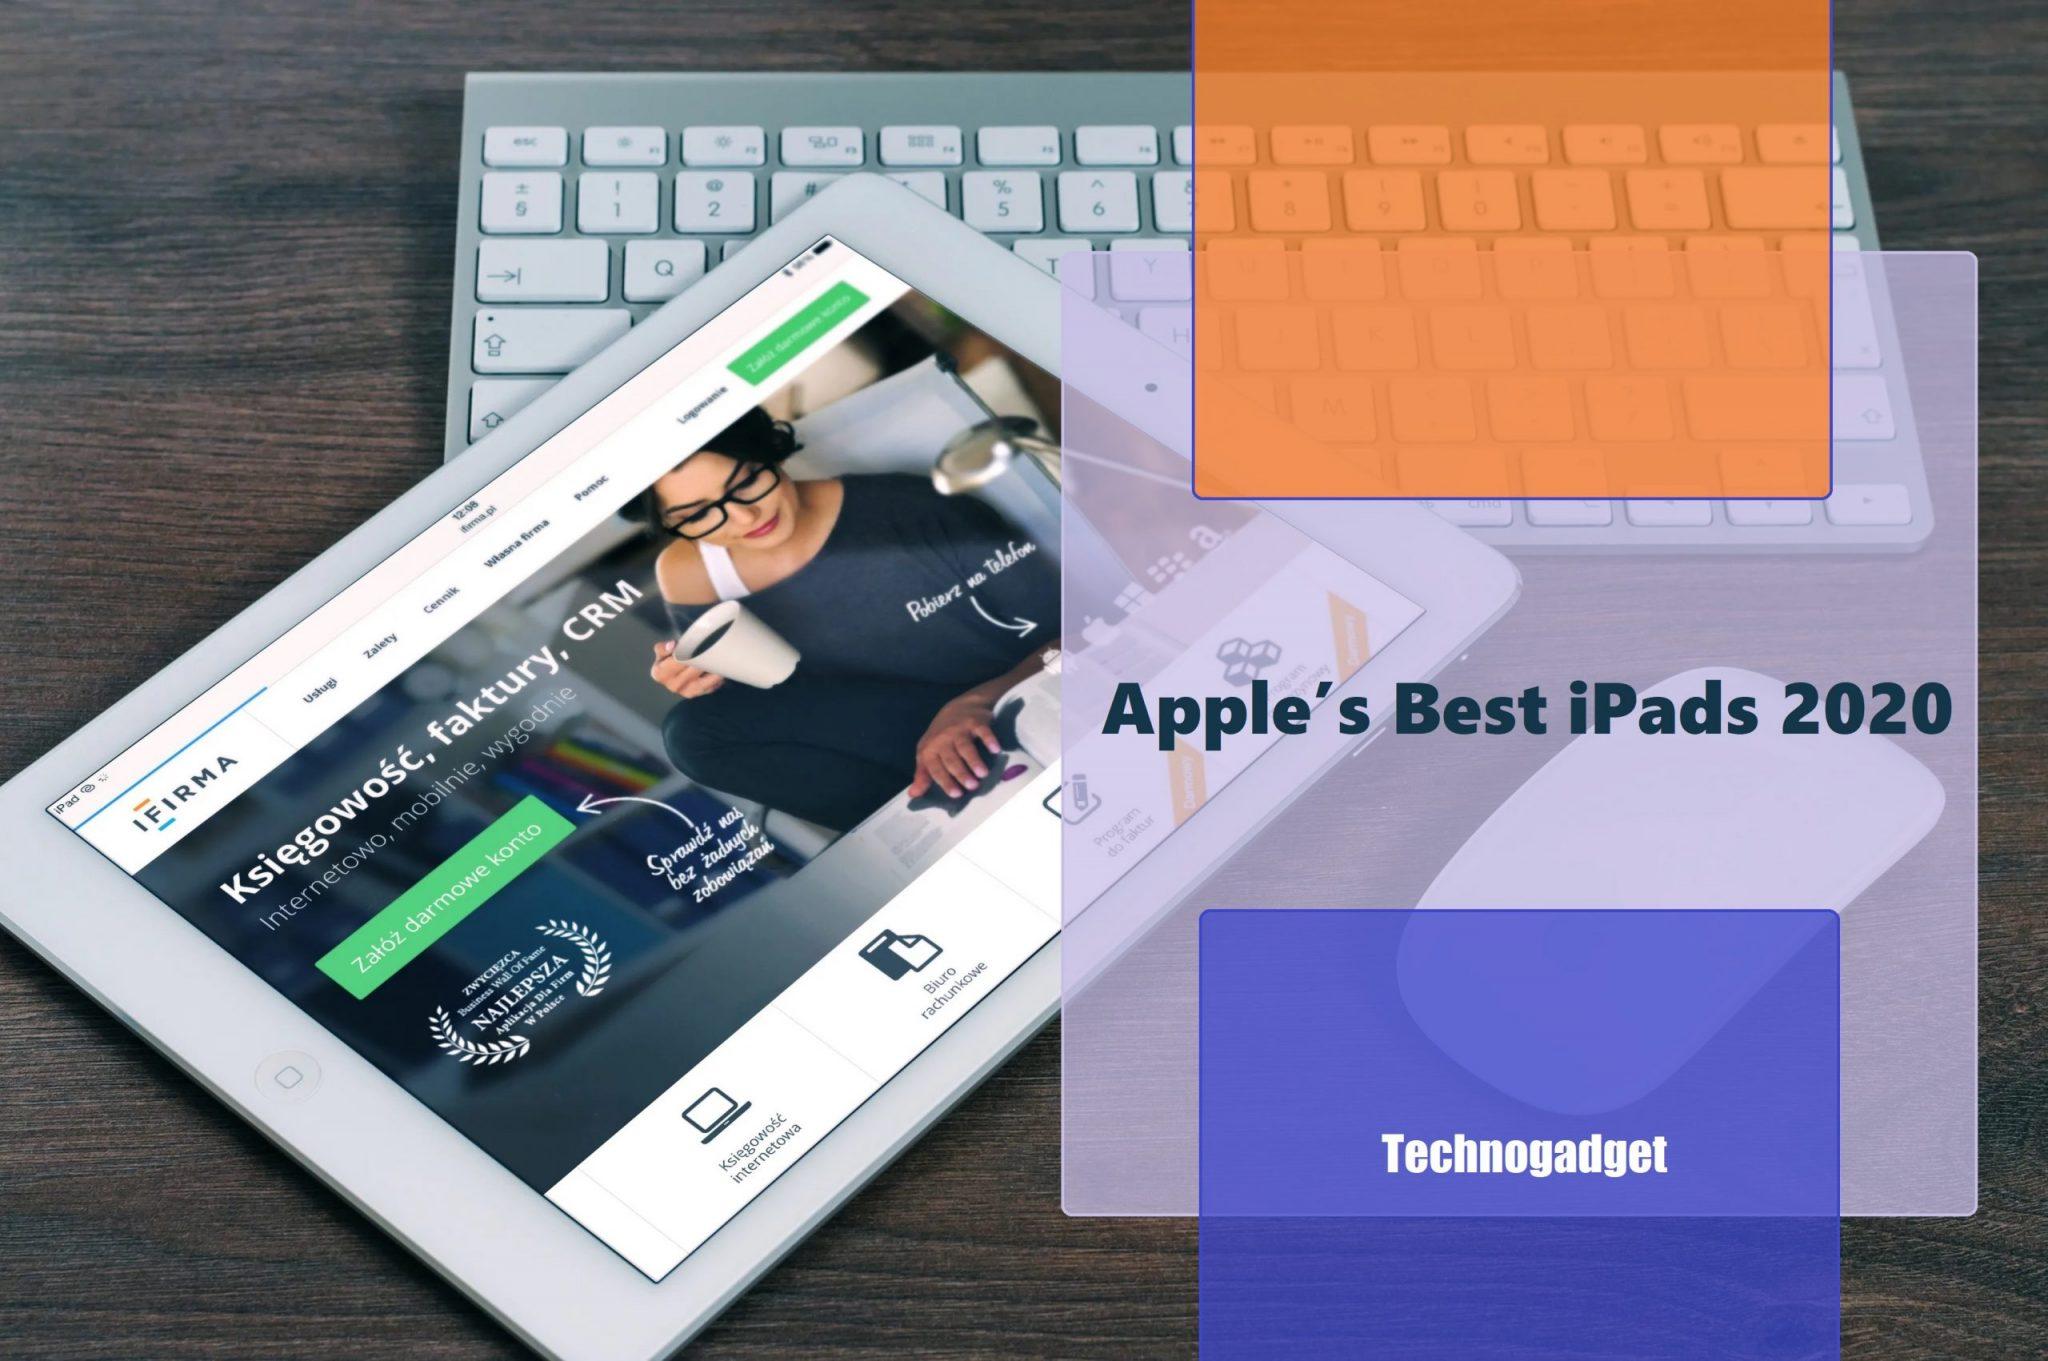 Apple's Best iPads 2020